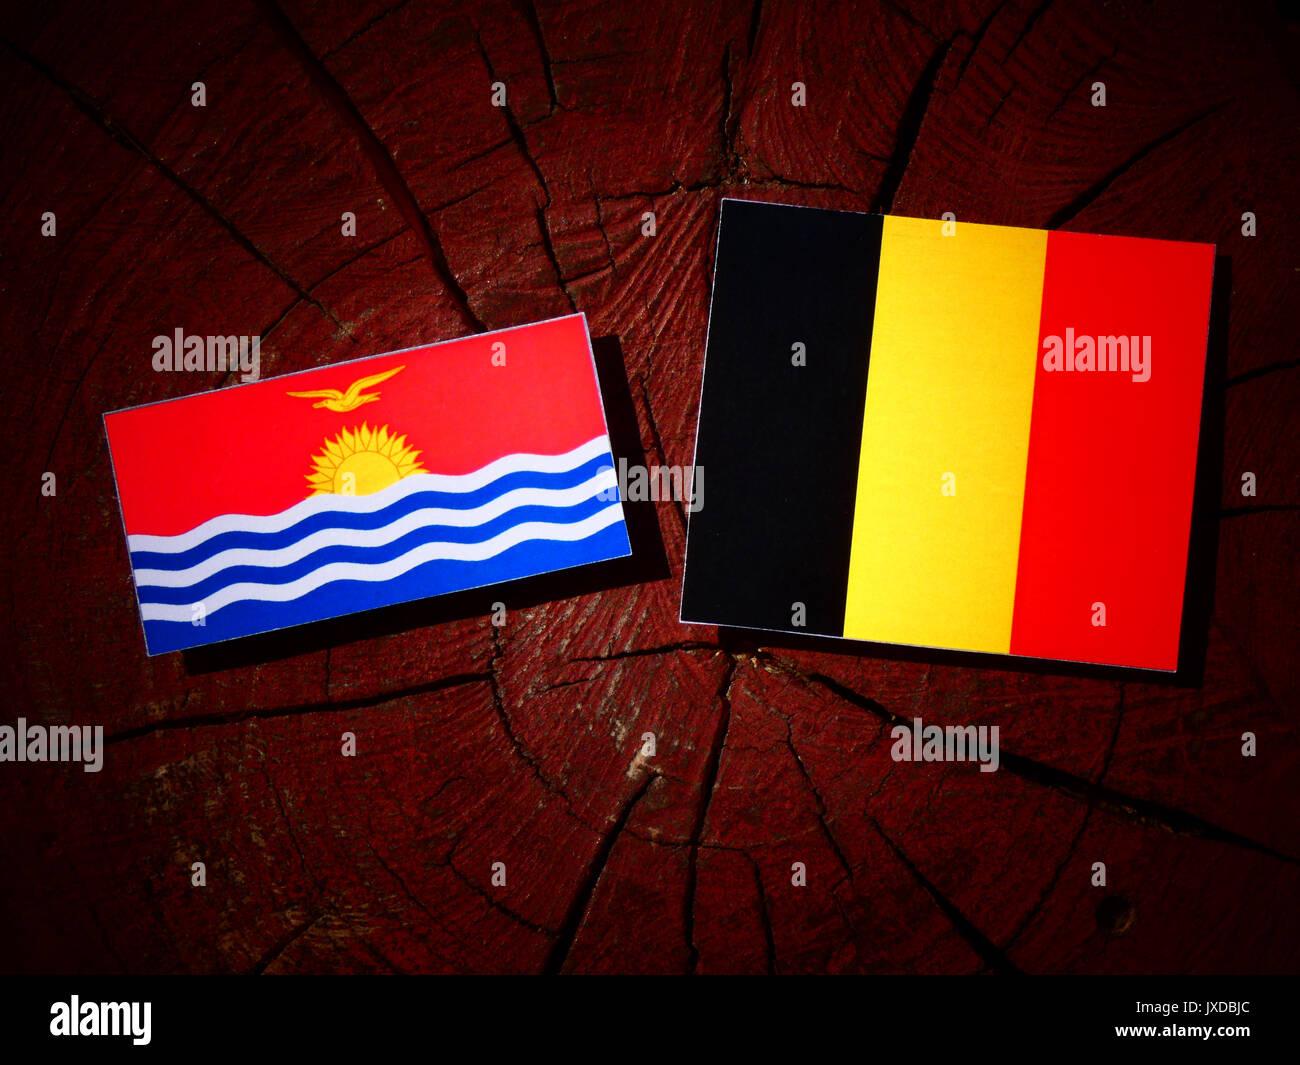 Kiribati flag with Belgian flag on a tree stump isolated - Stock Image